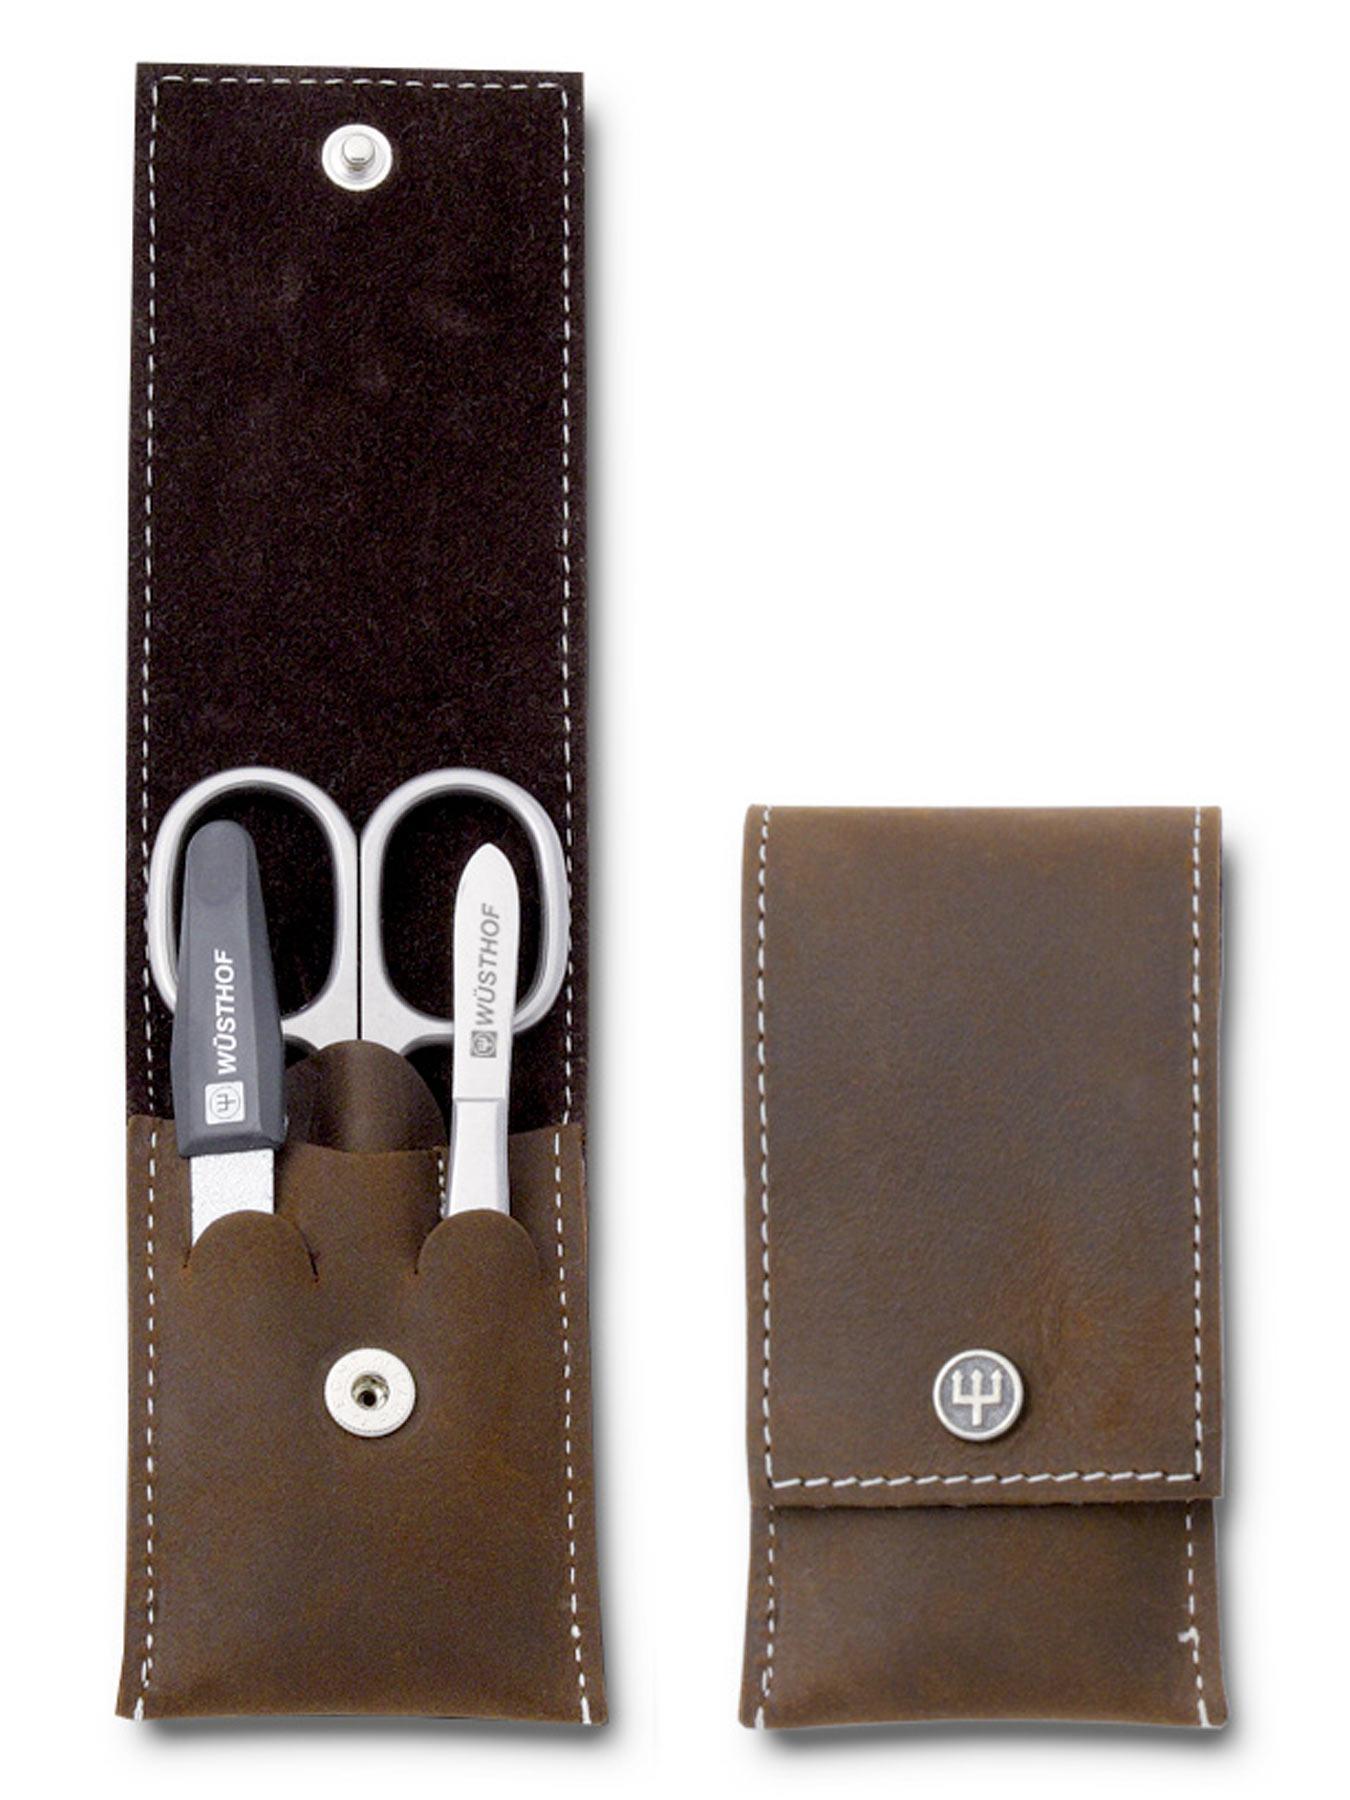 Wüsthof 9123 Nagelpflegeetui 3 teilig brown